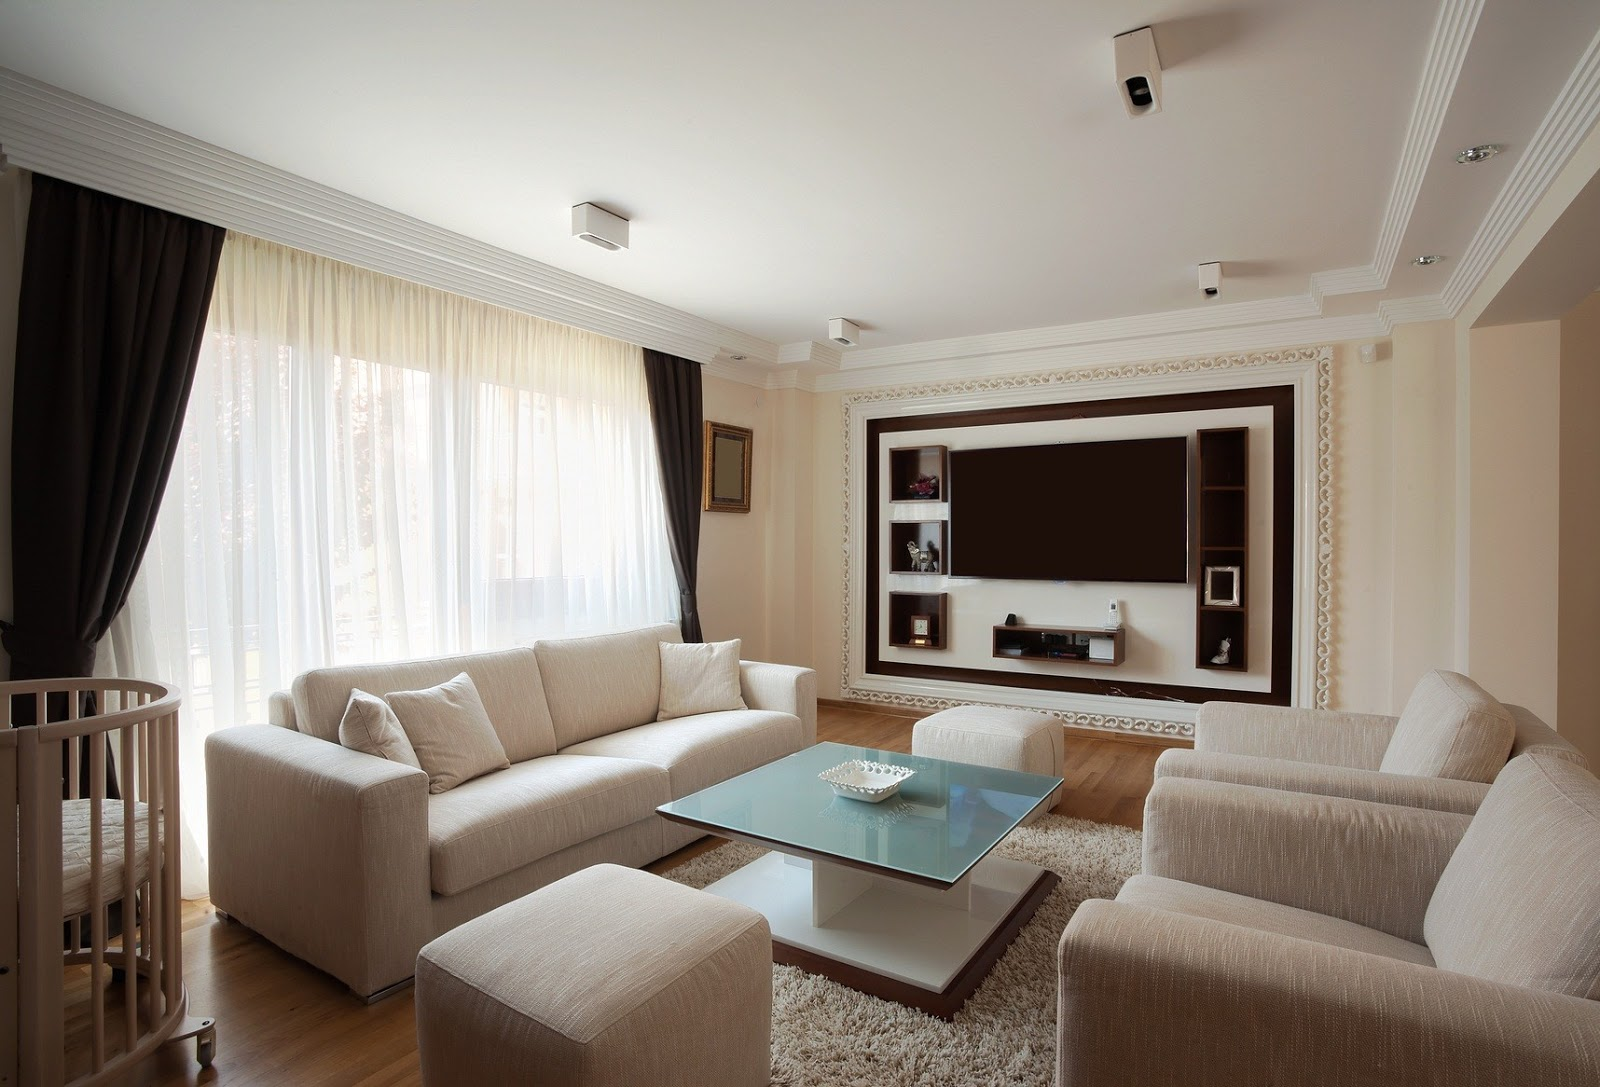 latest sofa designs in pakistan sofa design. Black Bedroom Furniture Sets. Home Design Ideas